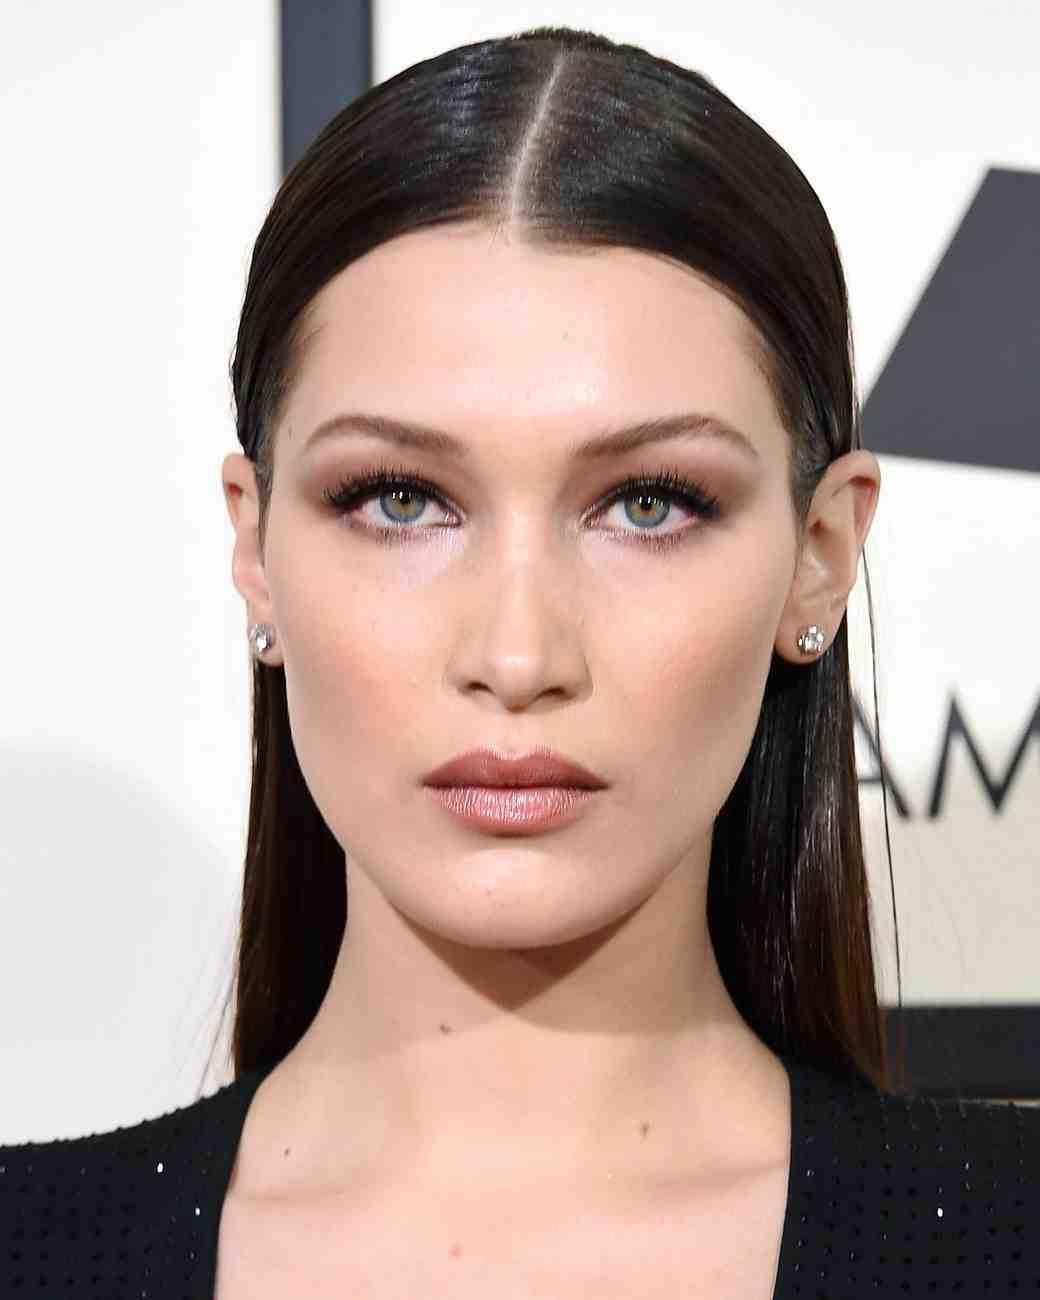 grammy-awards-2016-makeup-bella-hadid-0216.jpg